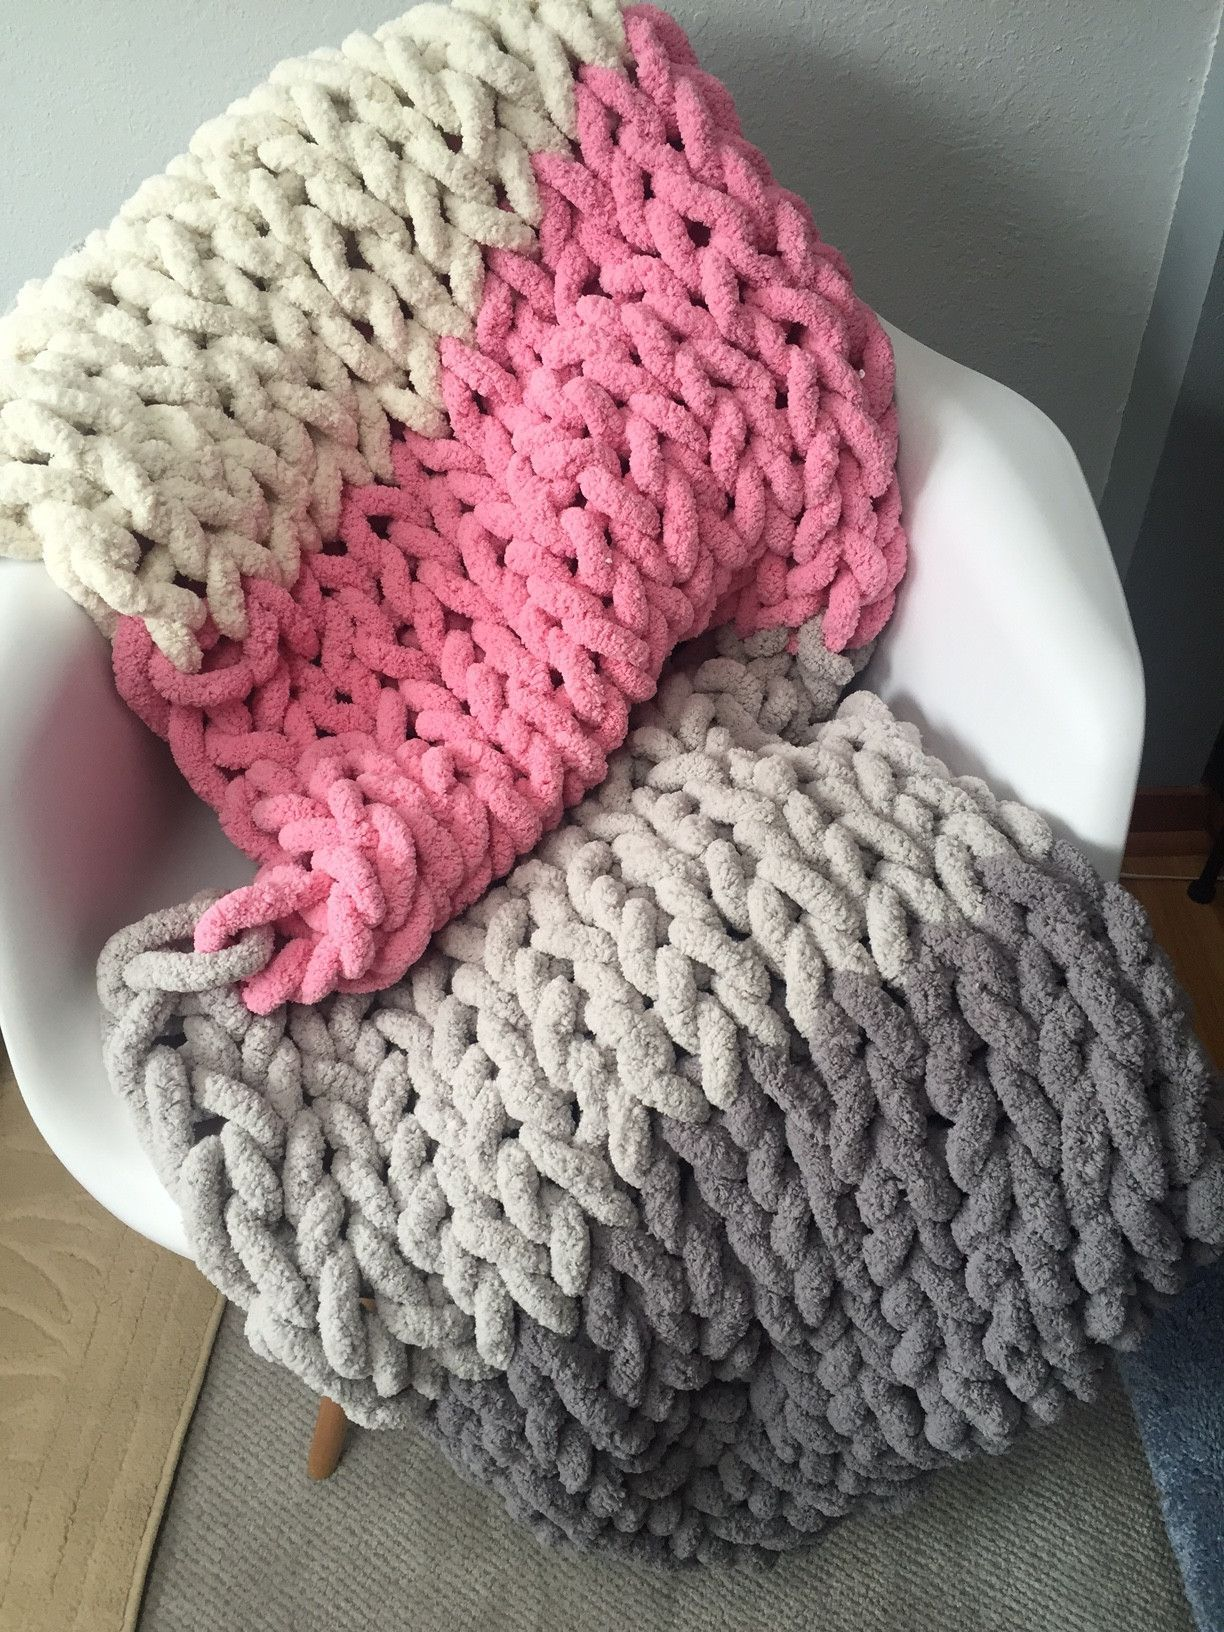 Super Chunky Chenille Yarn Blanket Chunky Yarn Blanket